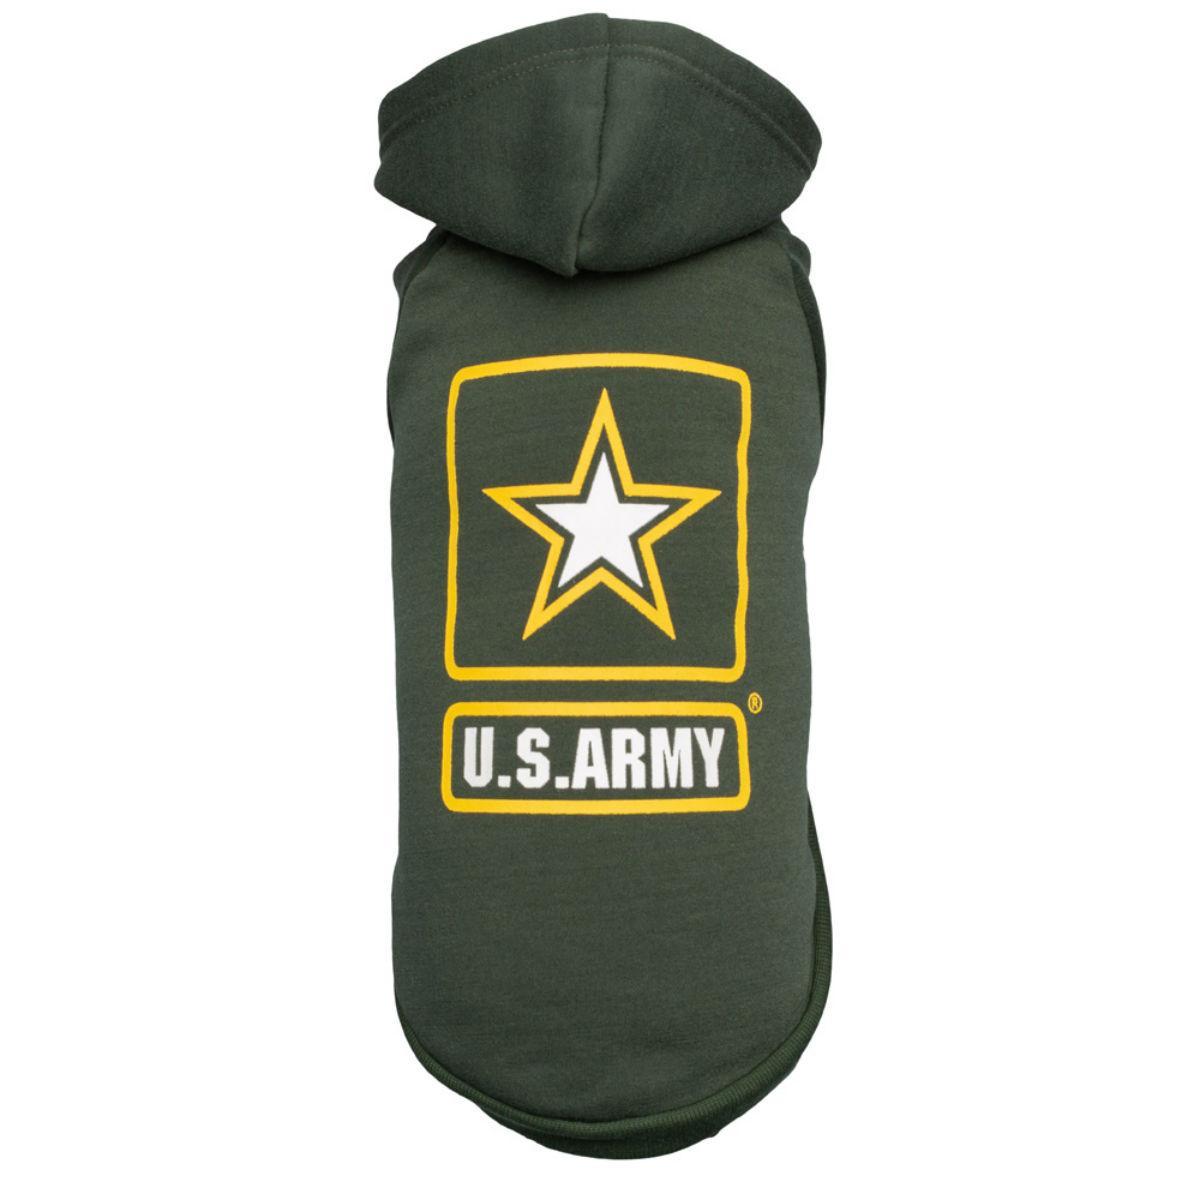 U.S. Army Dog Hoodie - Green